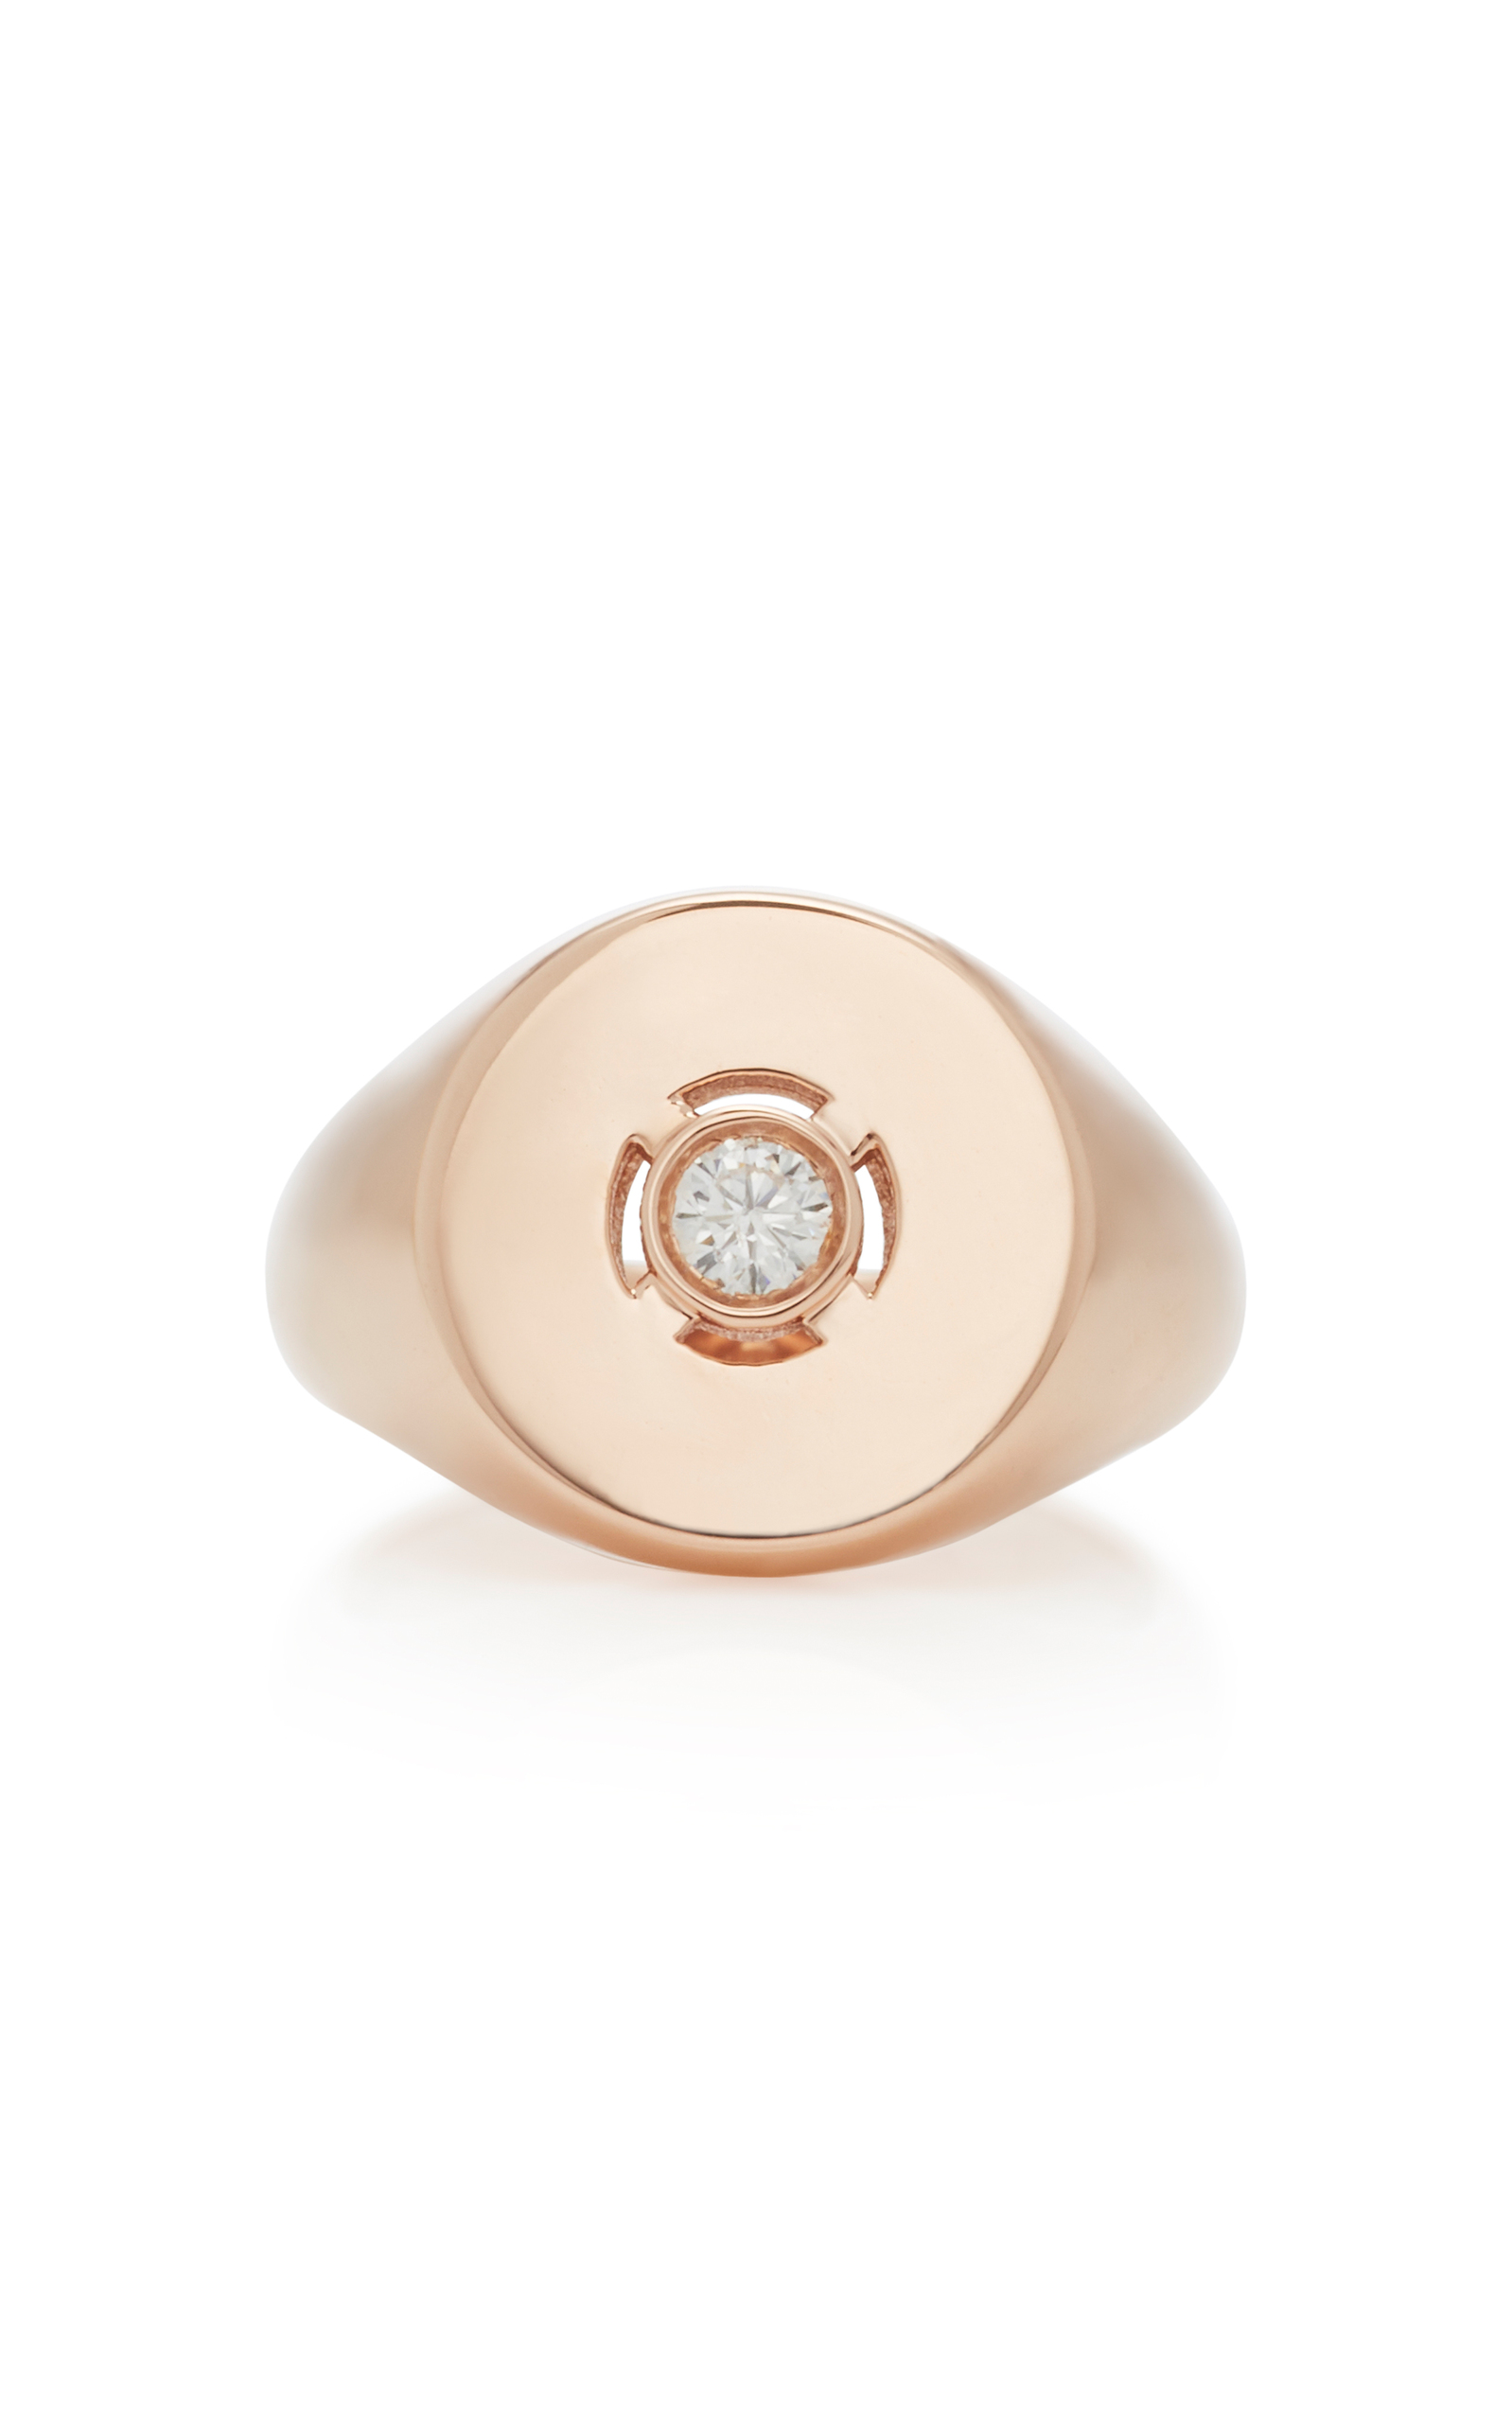 DISCUS 18K ROSE GOLD DIAMOND PINKY RING